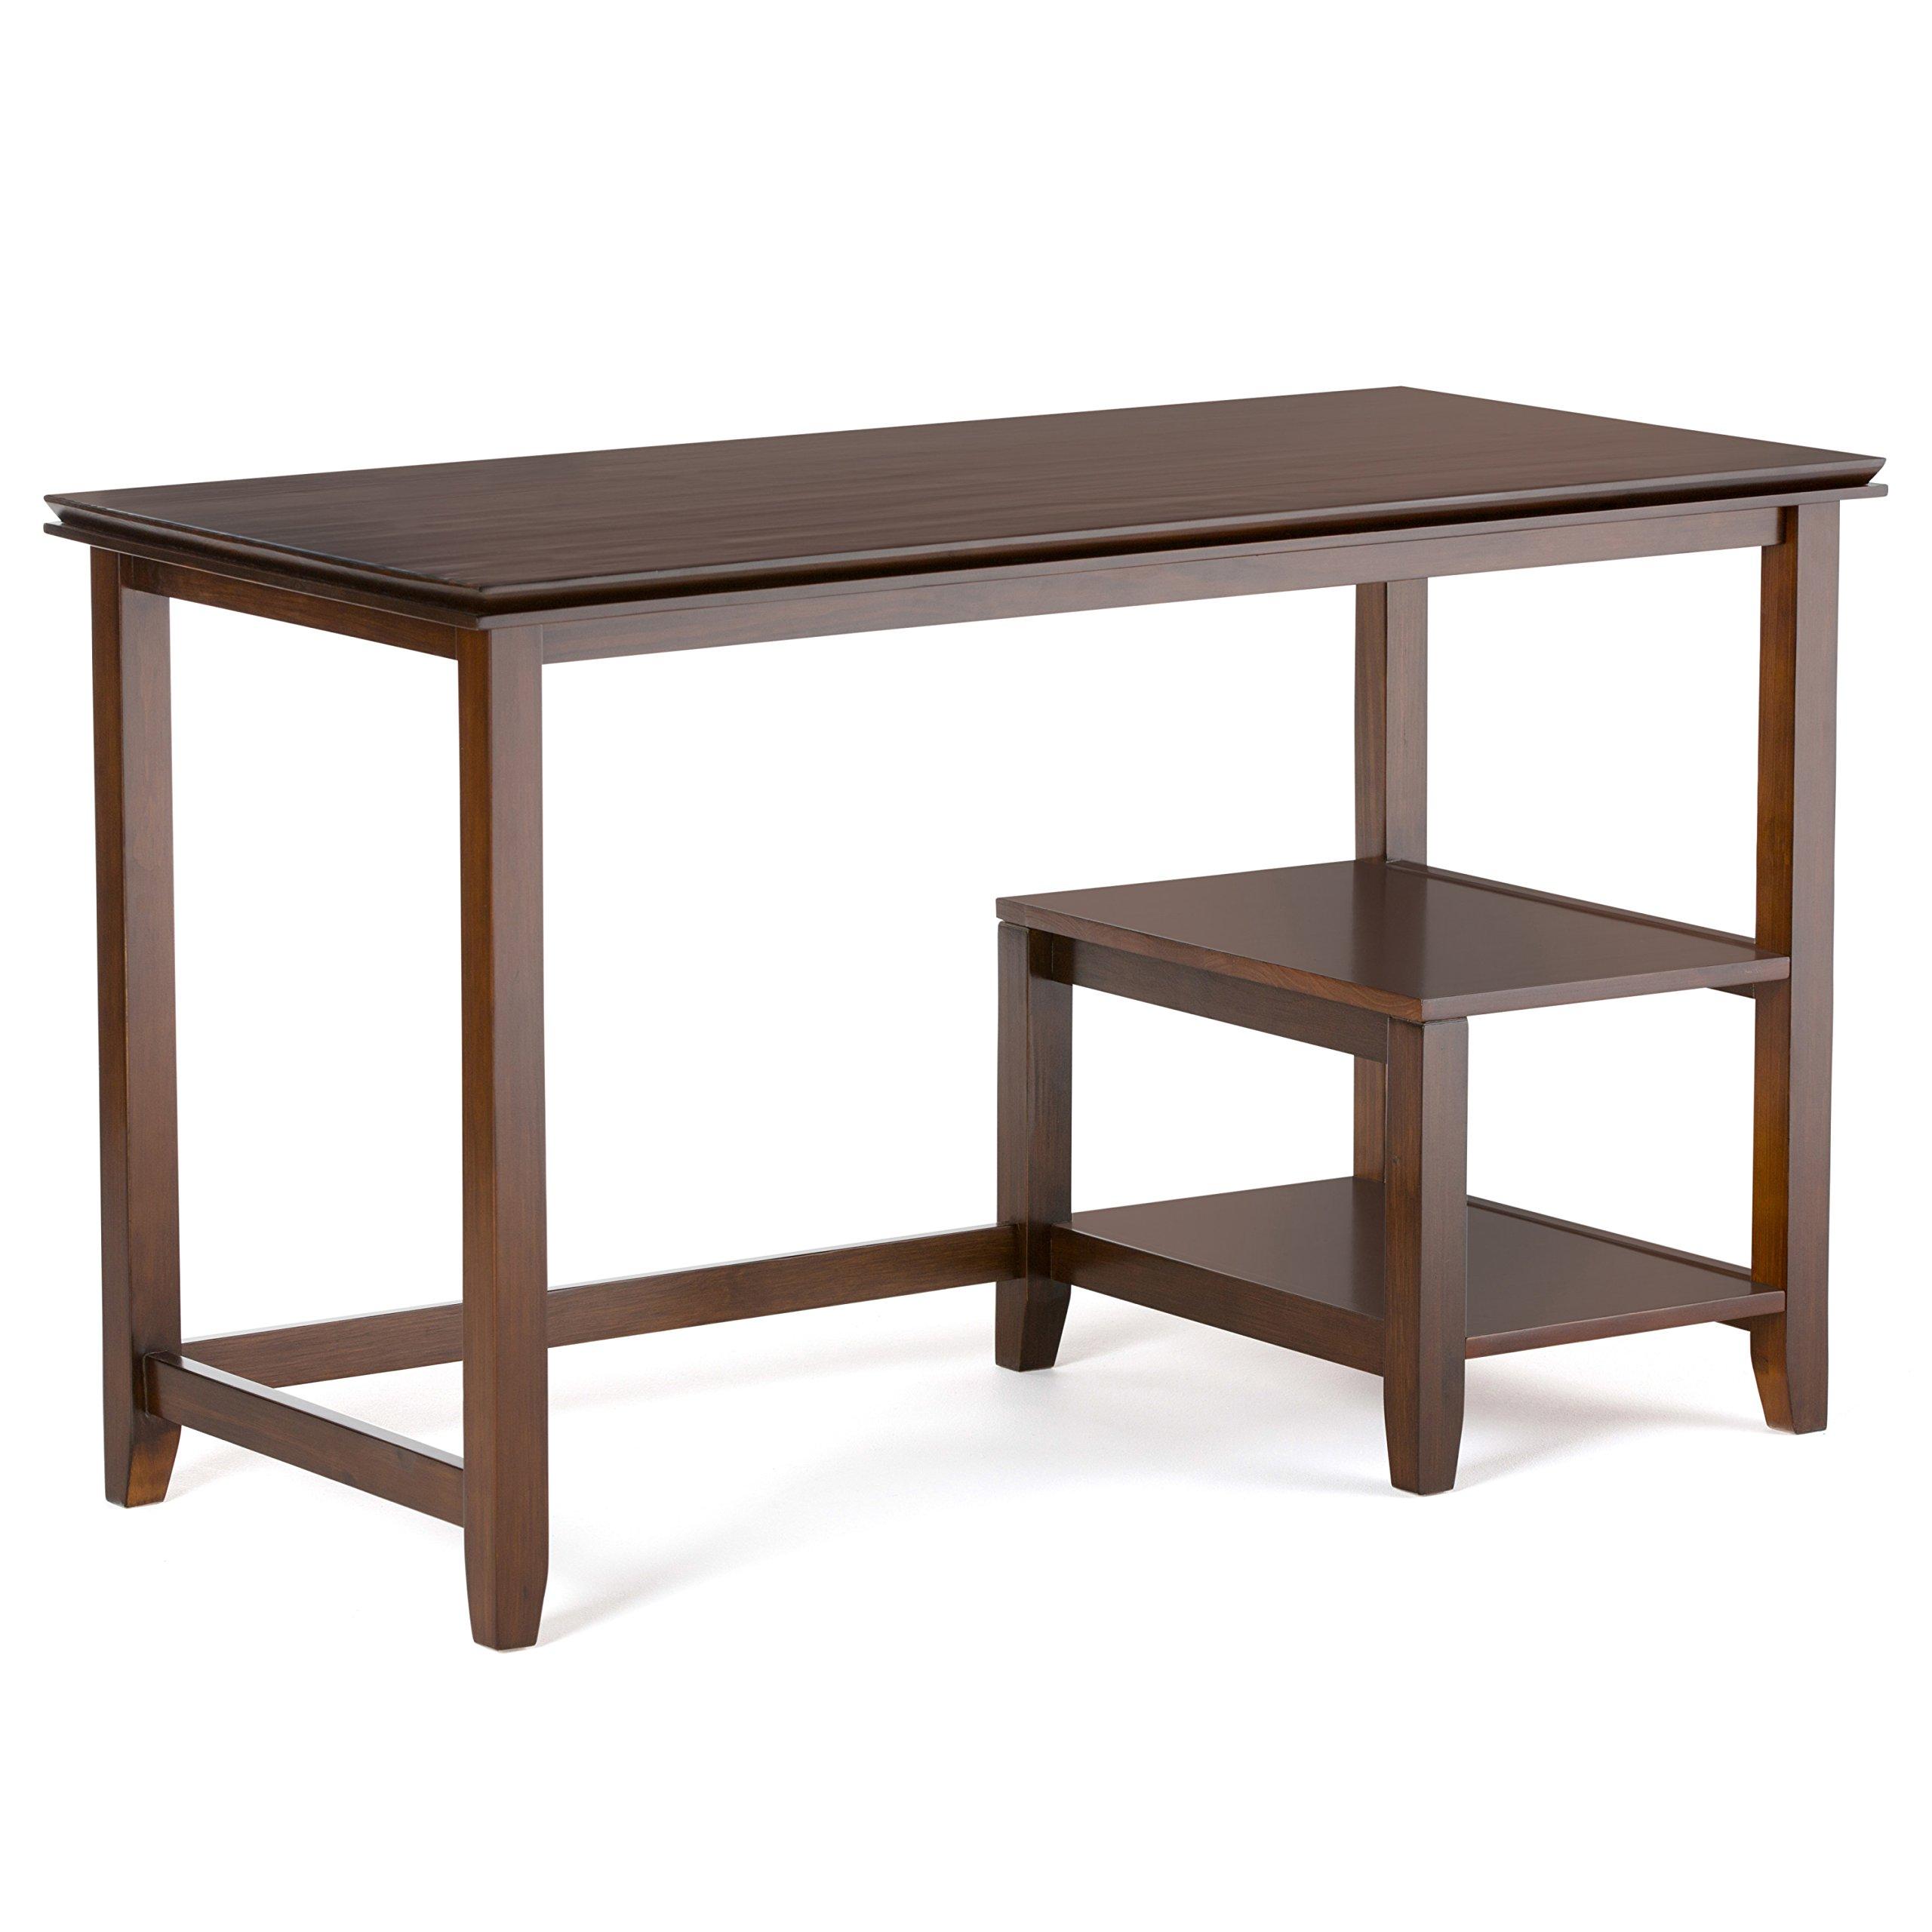 Simpli Home AXCHOL018 Artisan Solid Wood Contemporary 50 inch Wide Desk in Medium Auburn Brown by Simpli Home